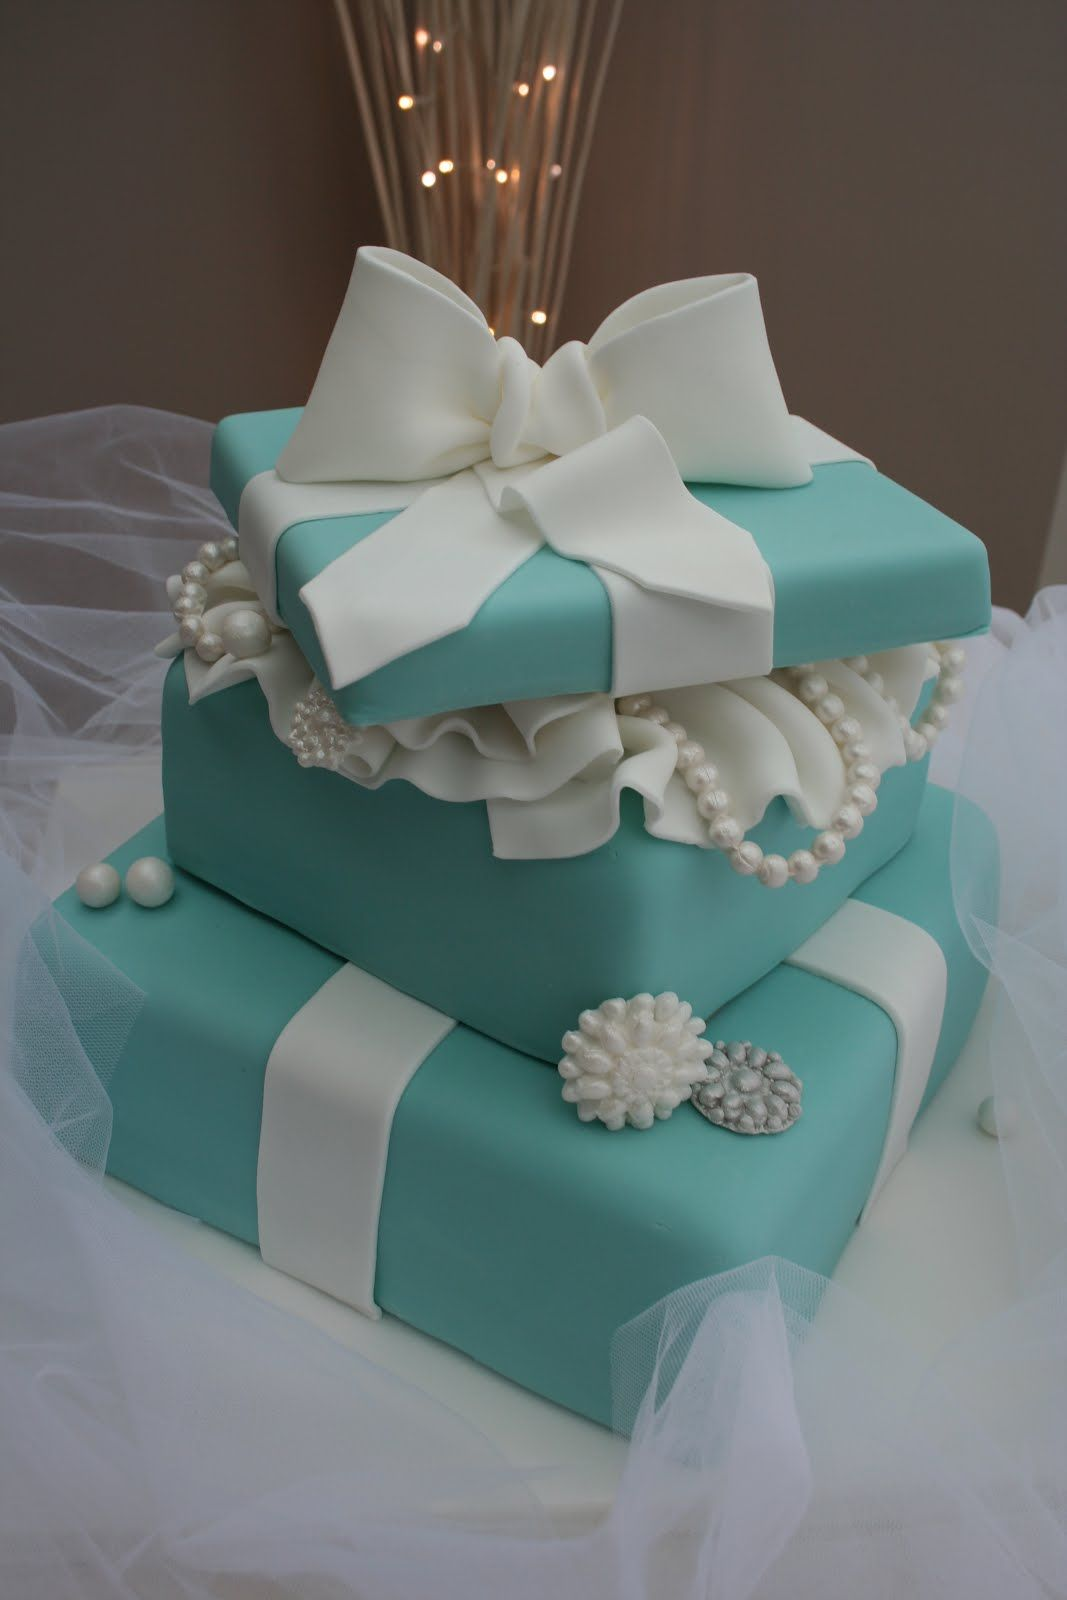 Tiffany blue package bridal shower cake   Flickr - Photo ...  Tiffany Bridal Shower Cakes